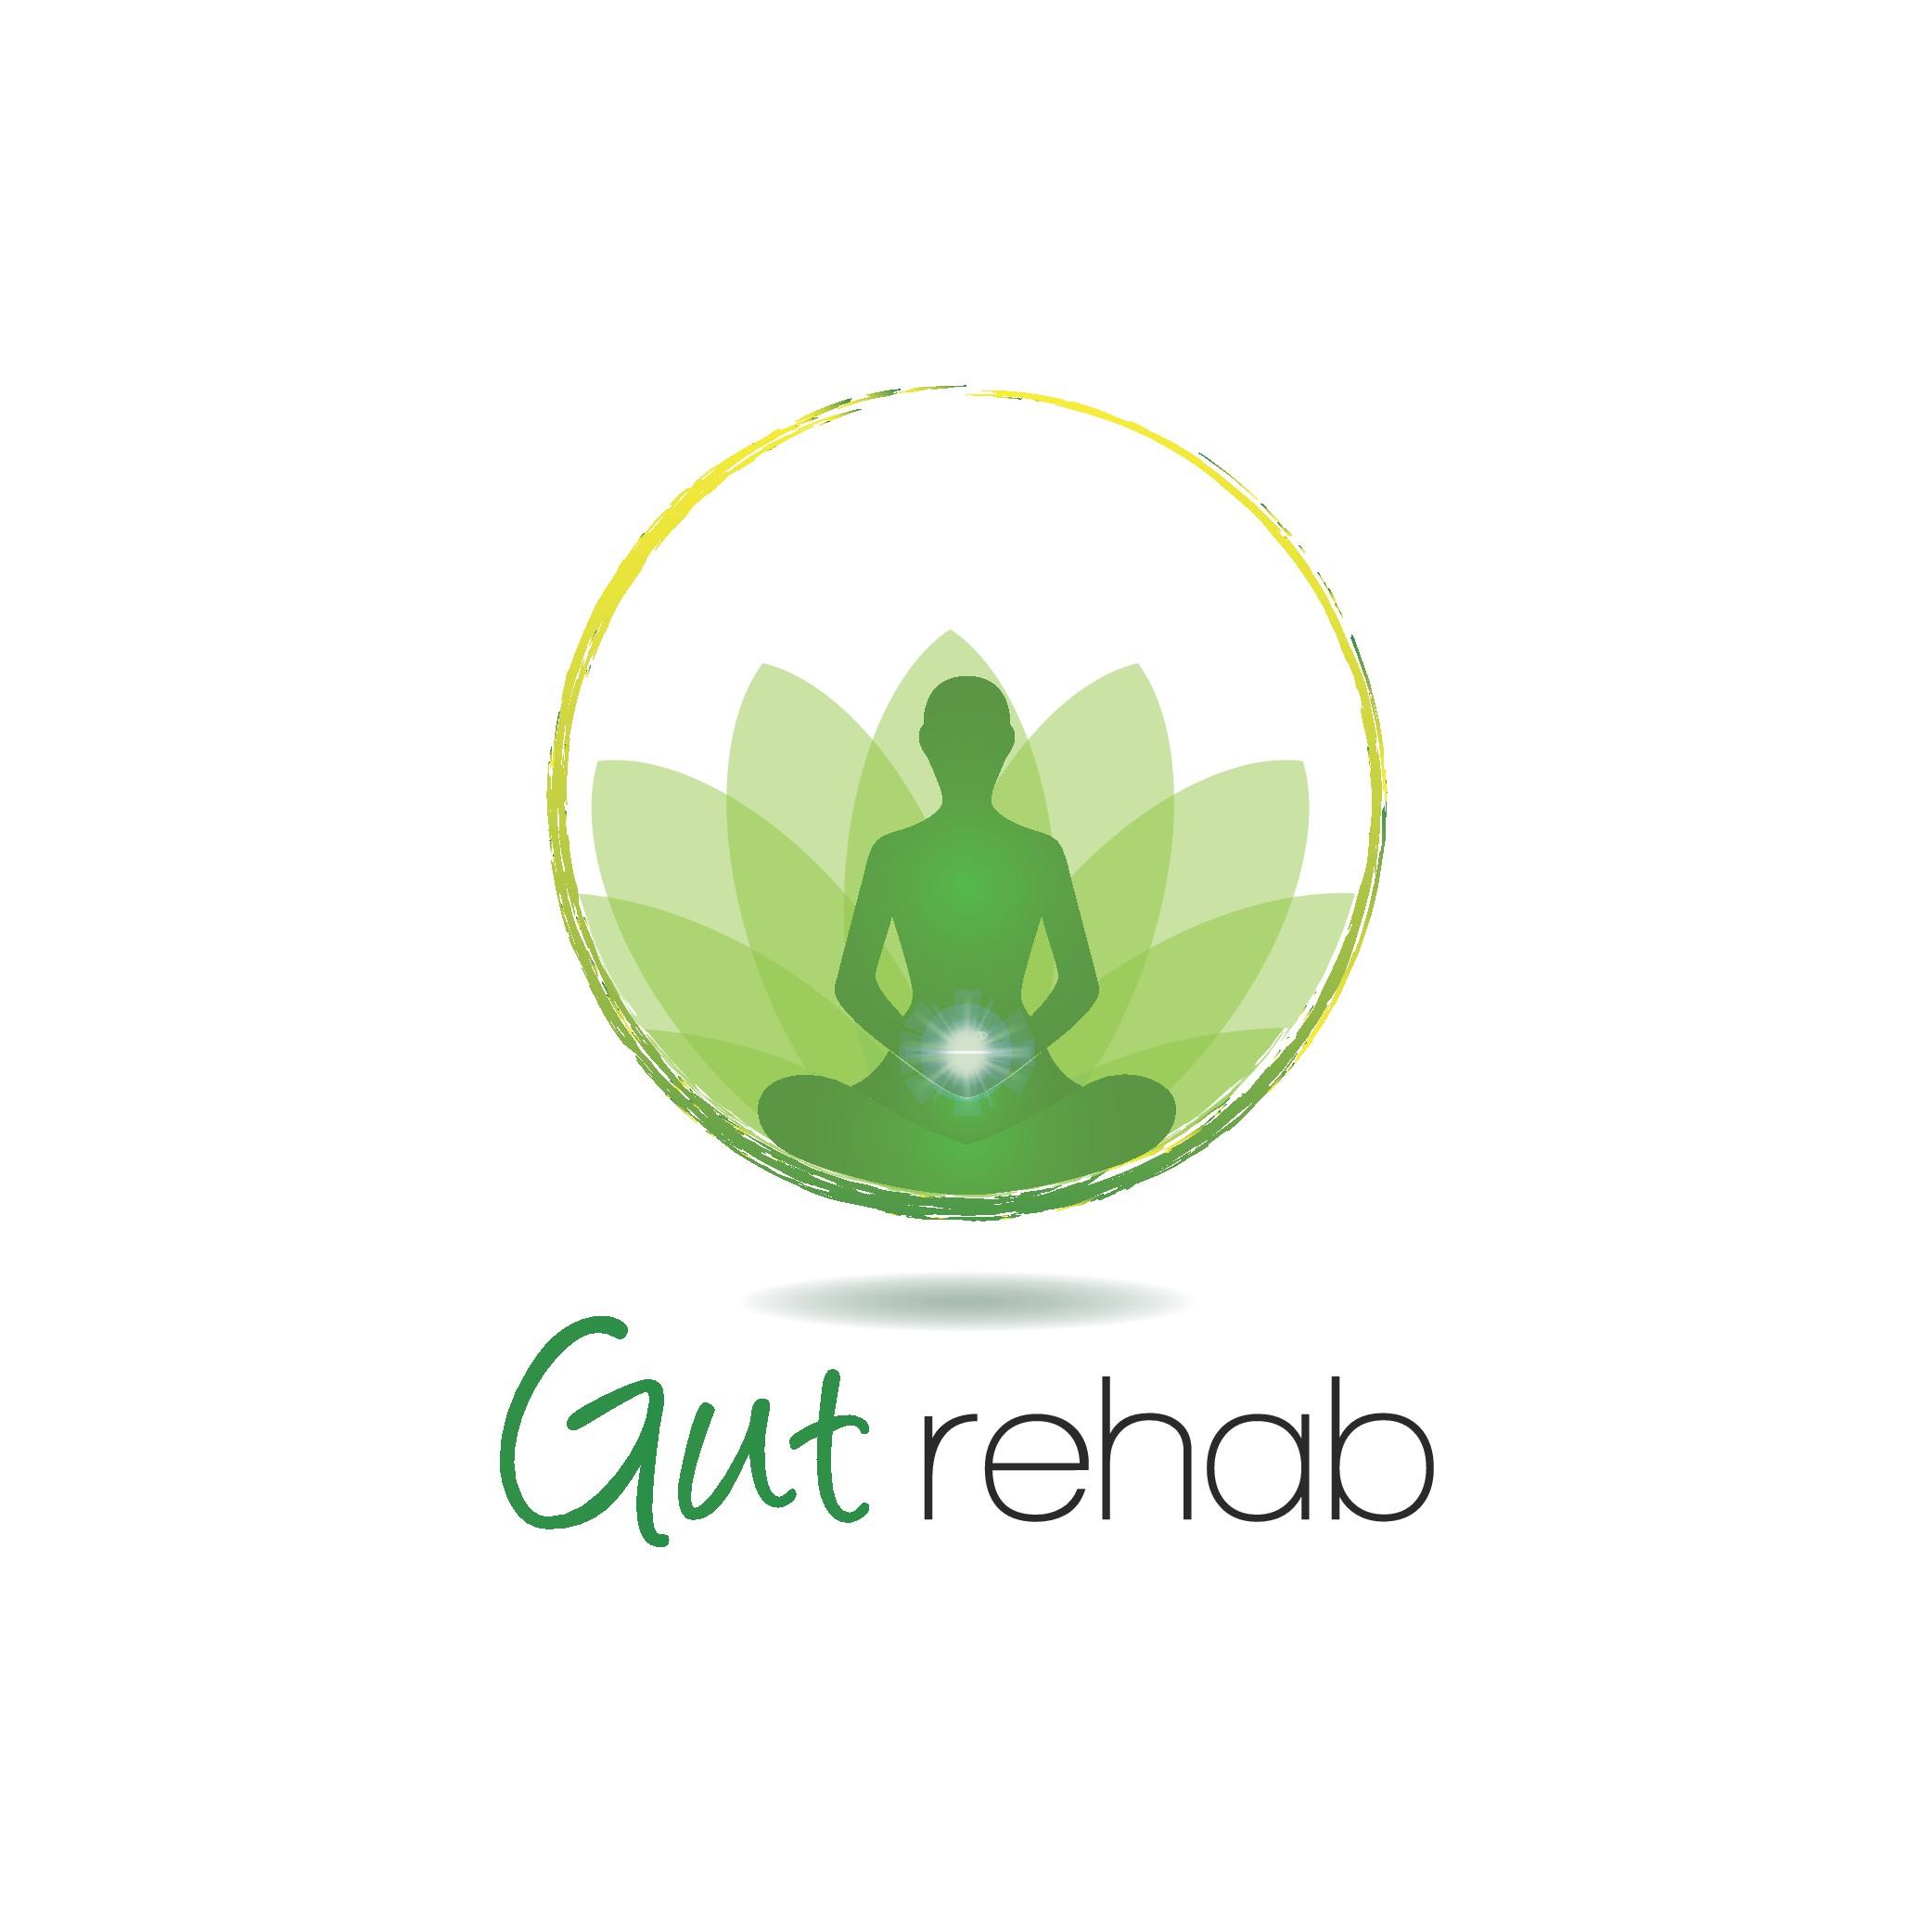 Create a uplifting logo for a gut health awakening healing program